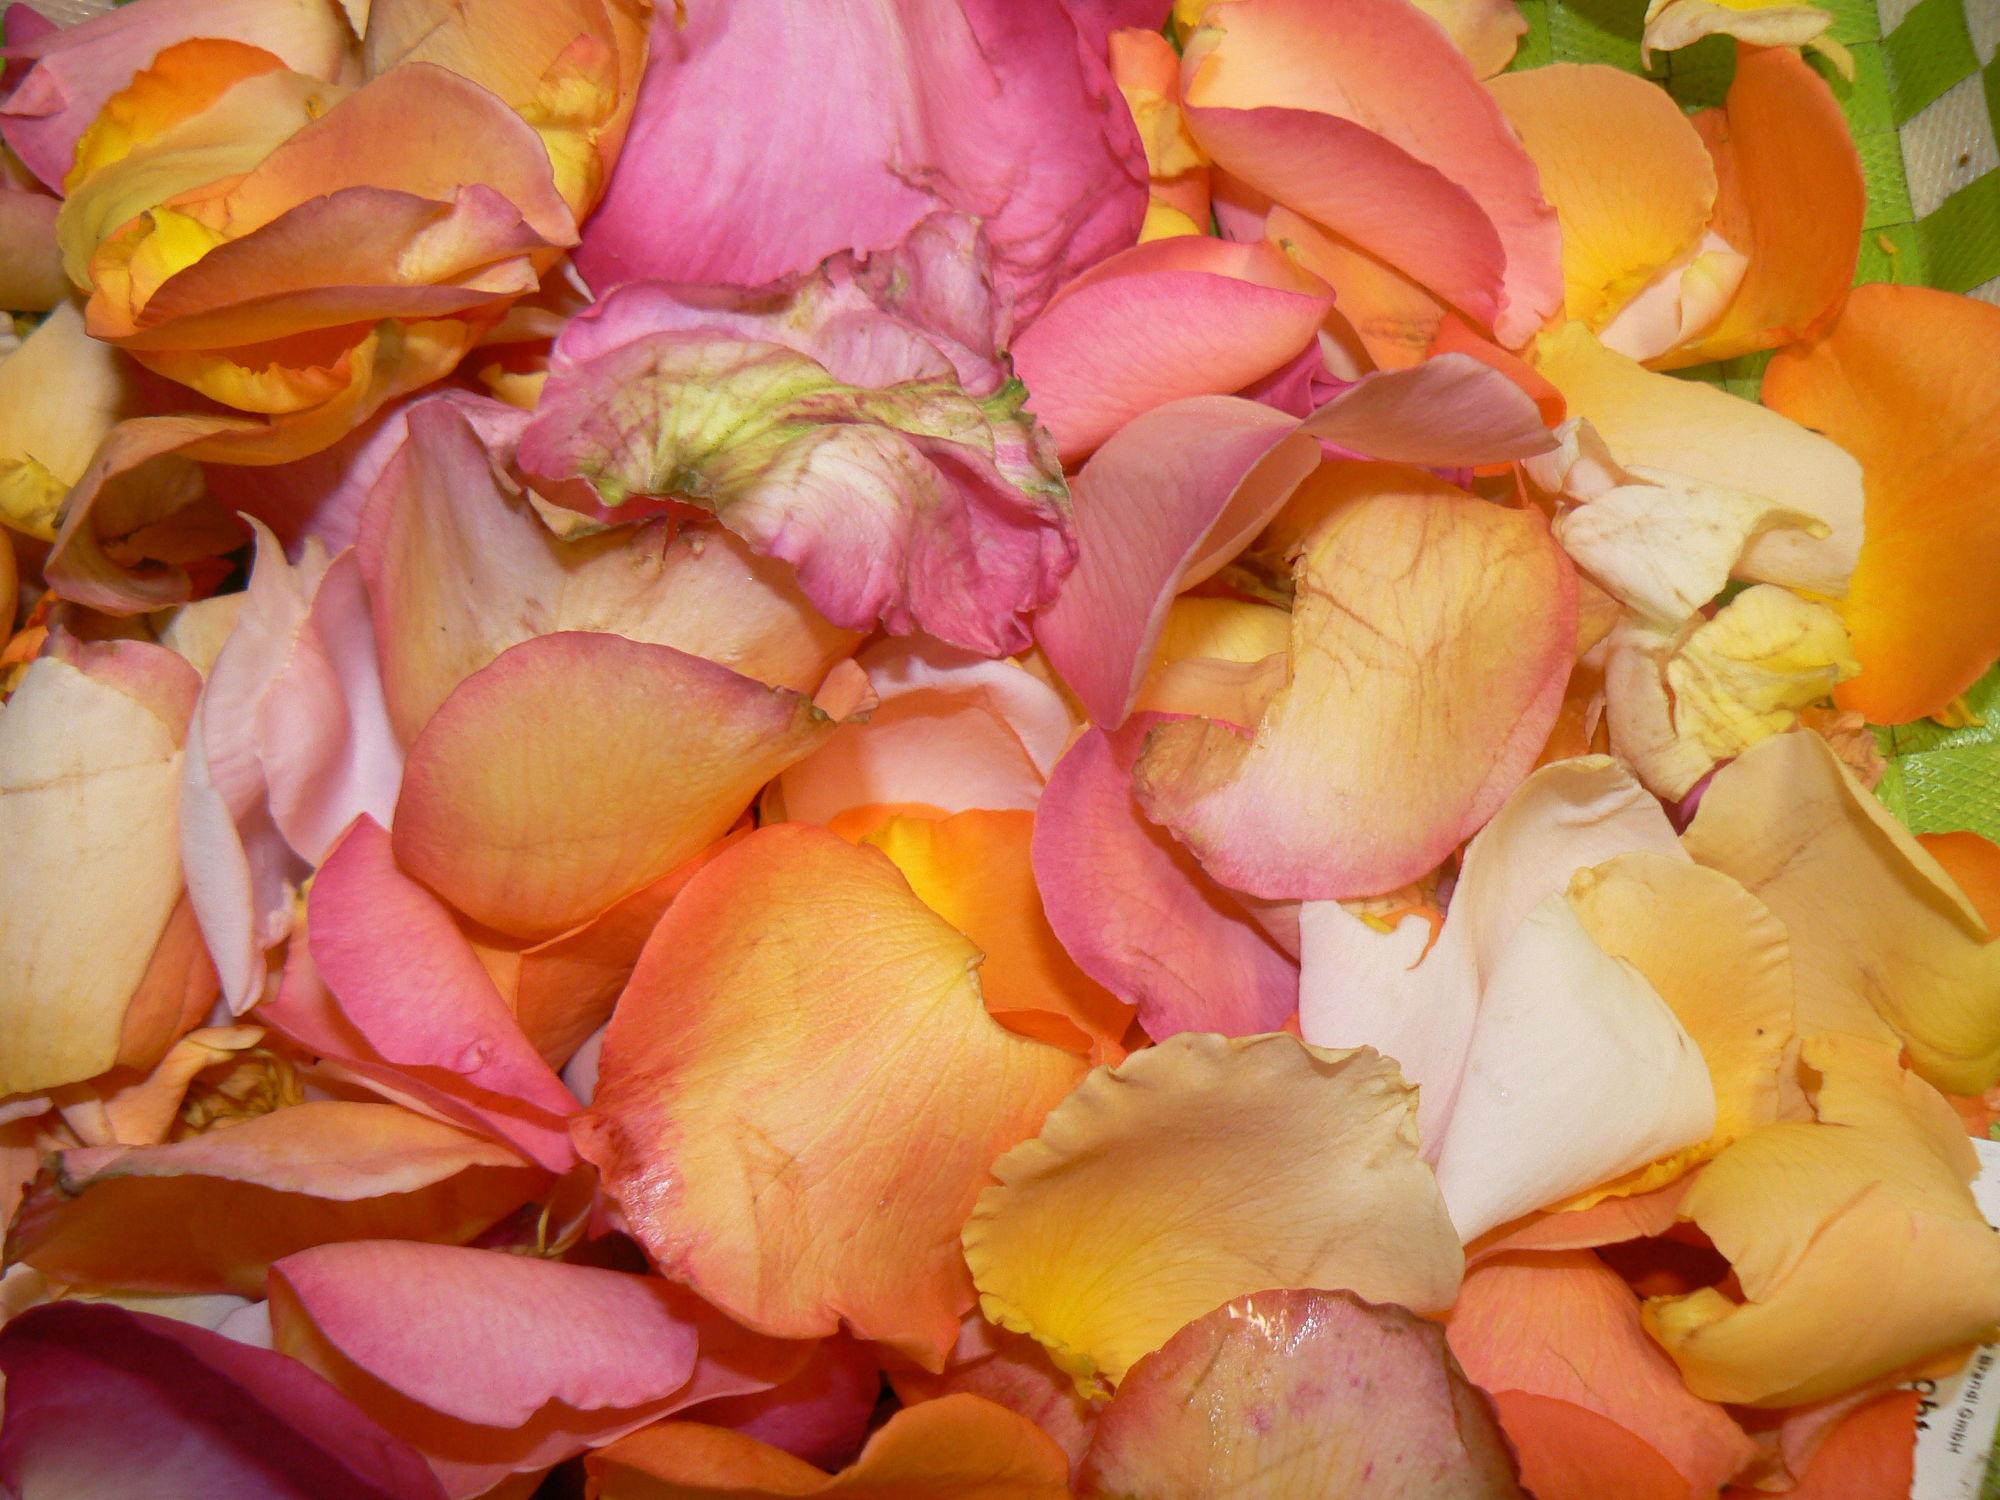 Bild mit Pflanzen, Rosen, Blätter, Pflanze, Rose, romantik, Blüten, blüte, Liebe